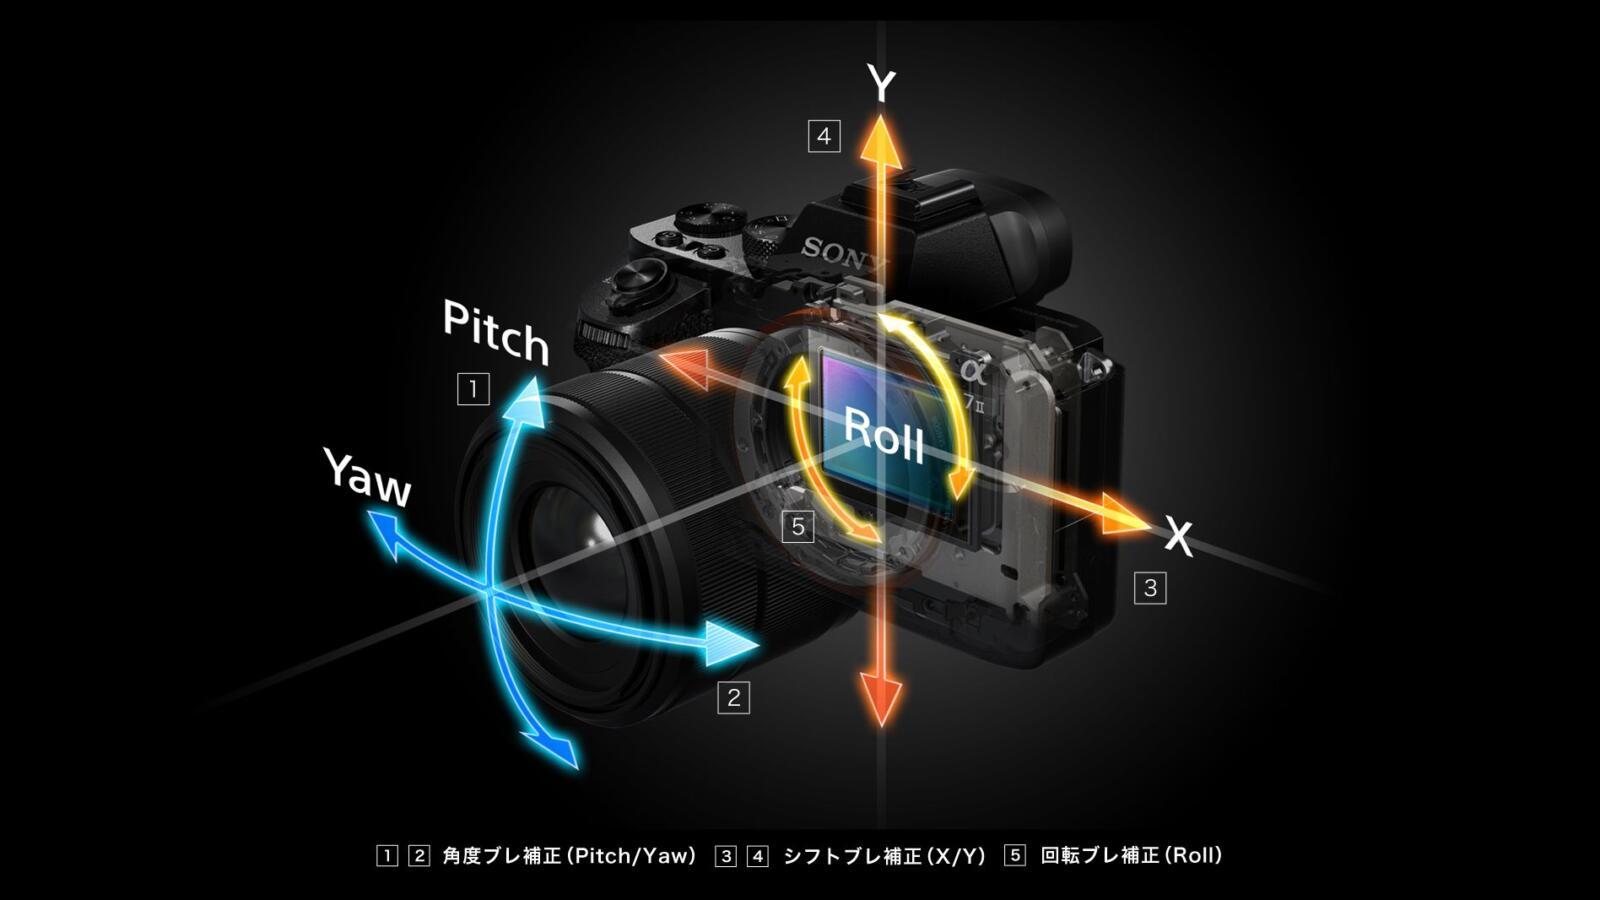 cam Kamera sony a7 Systemkamera Video